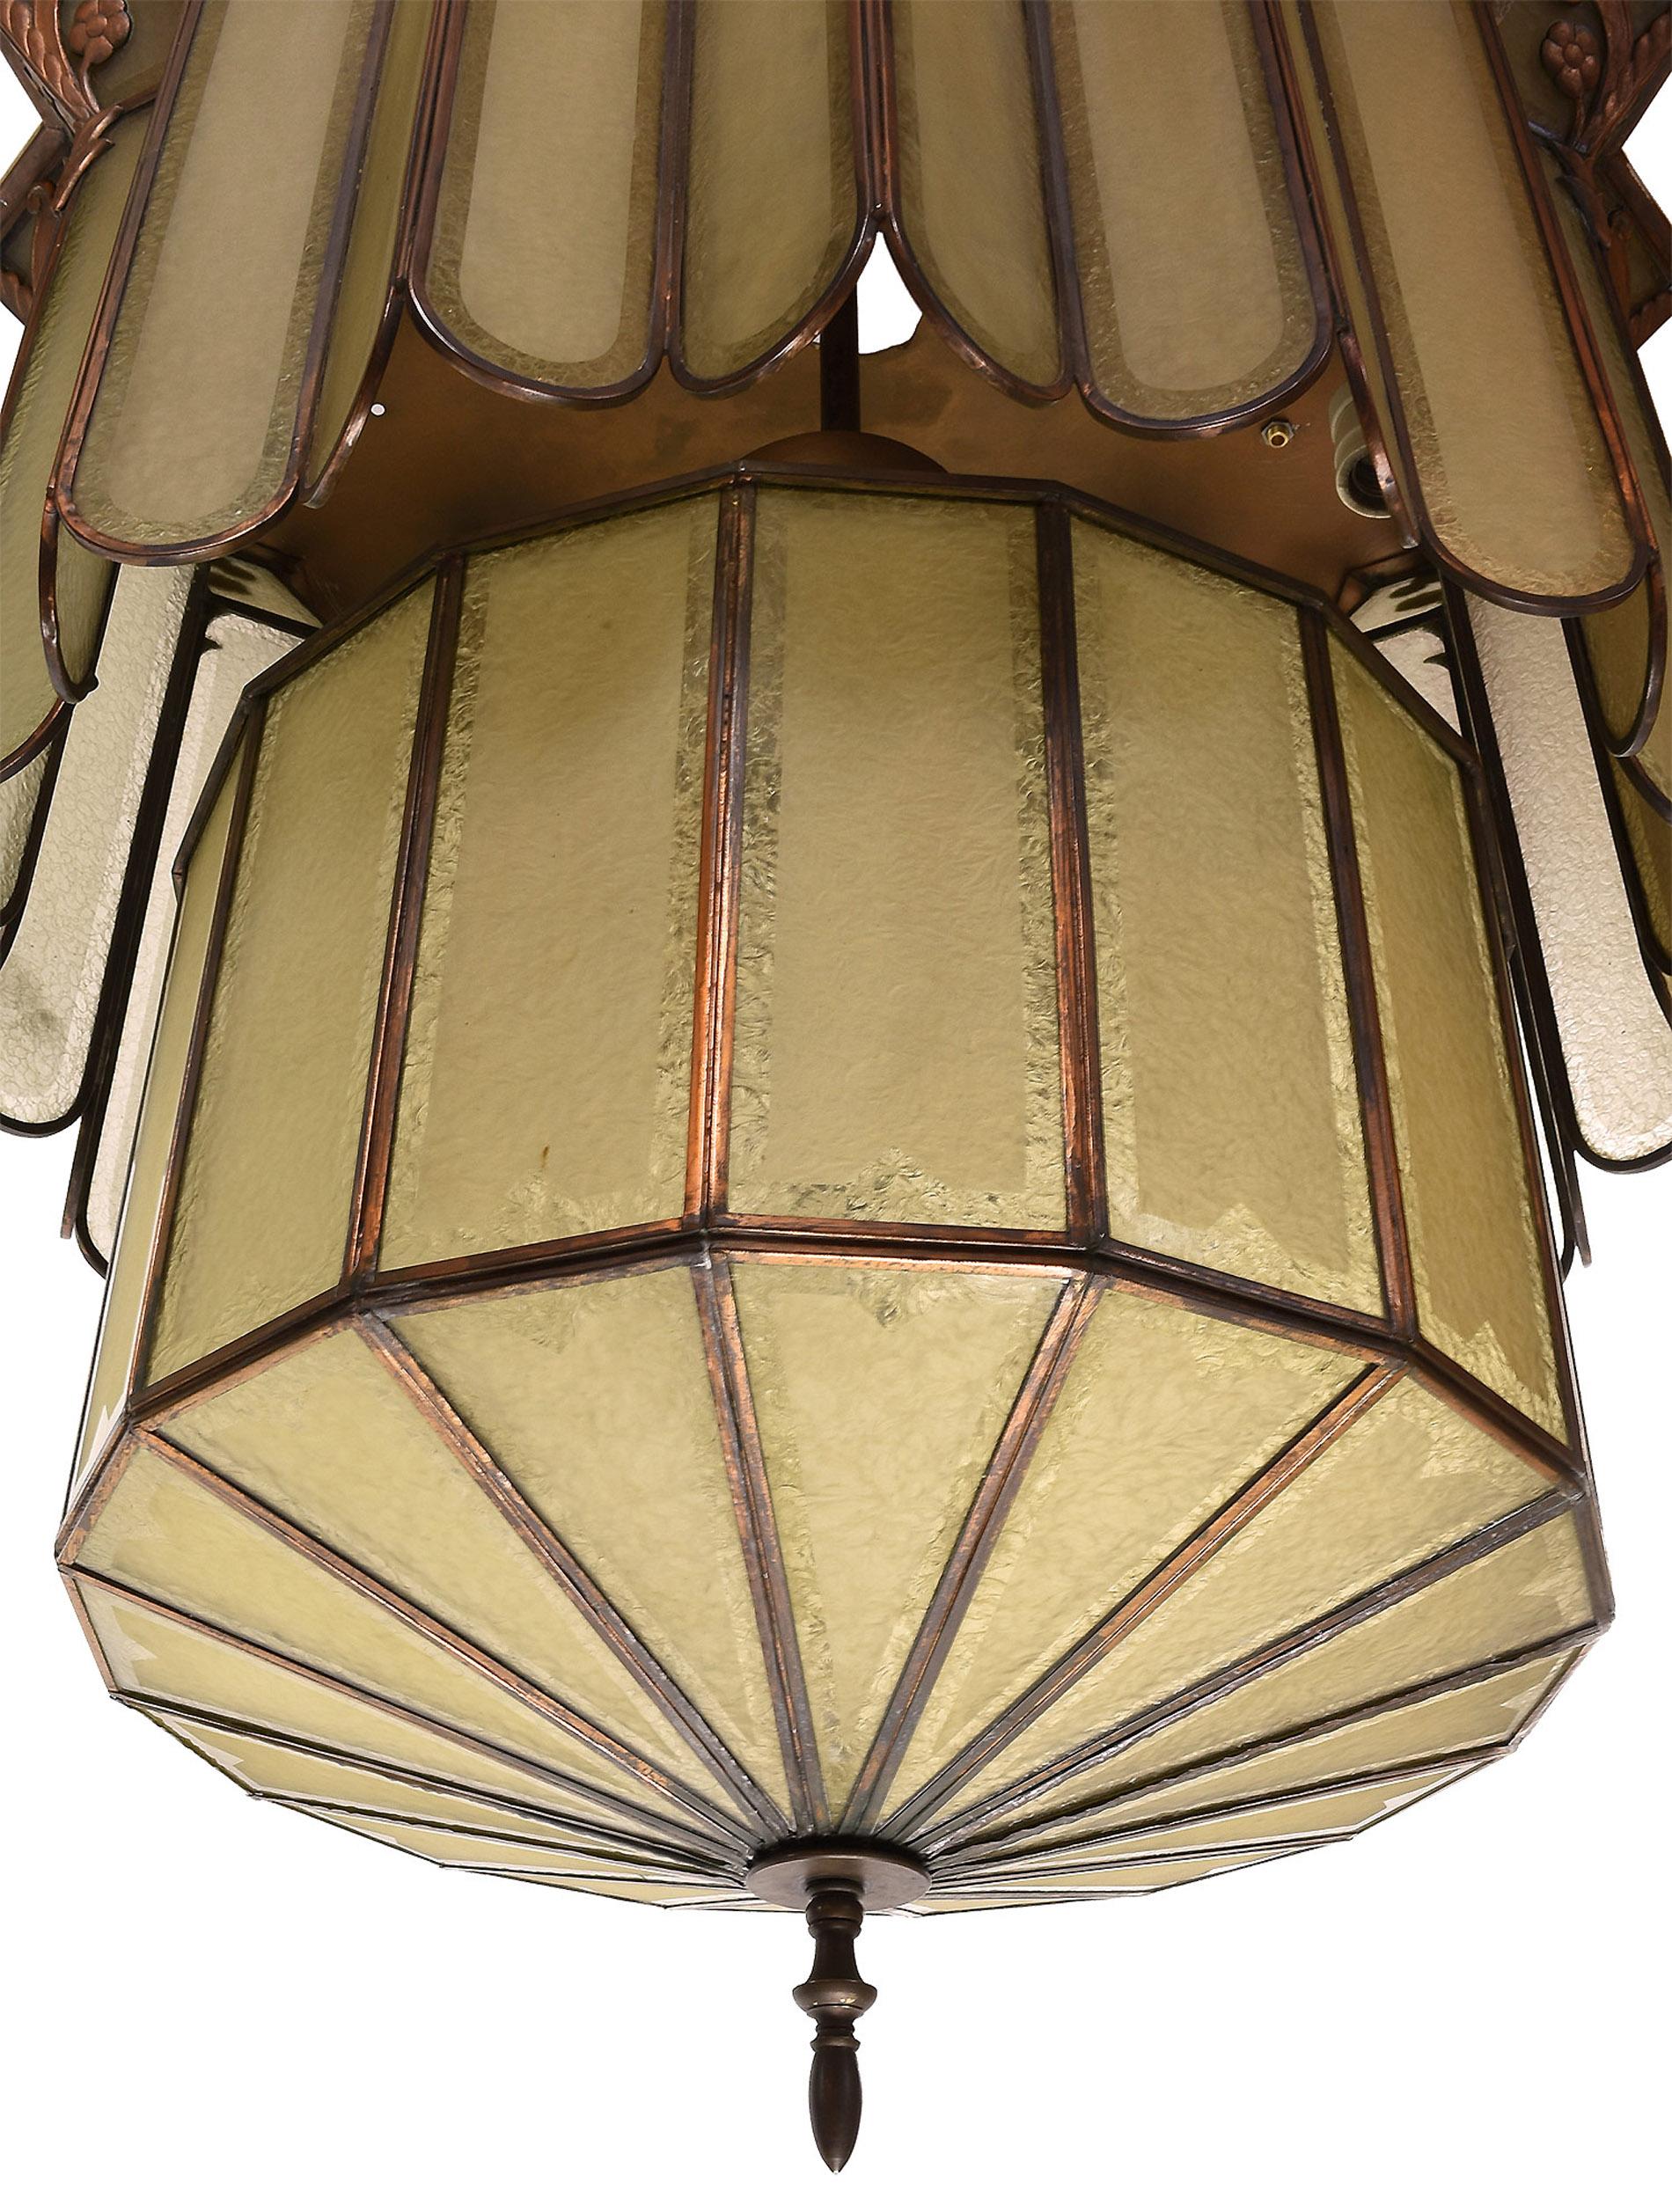 46929 Art Deco 2 piece more than a pendant 3A1500.jpg